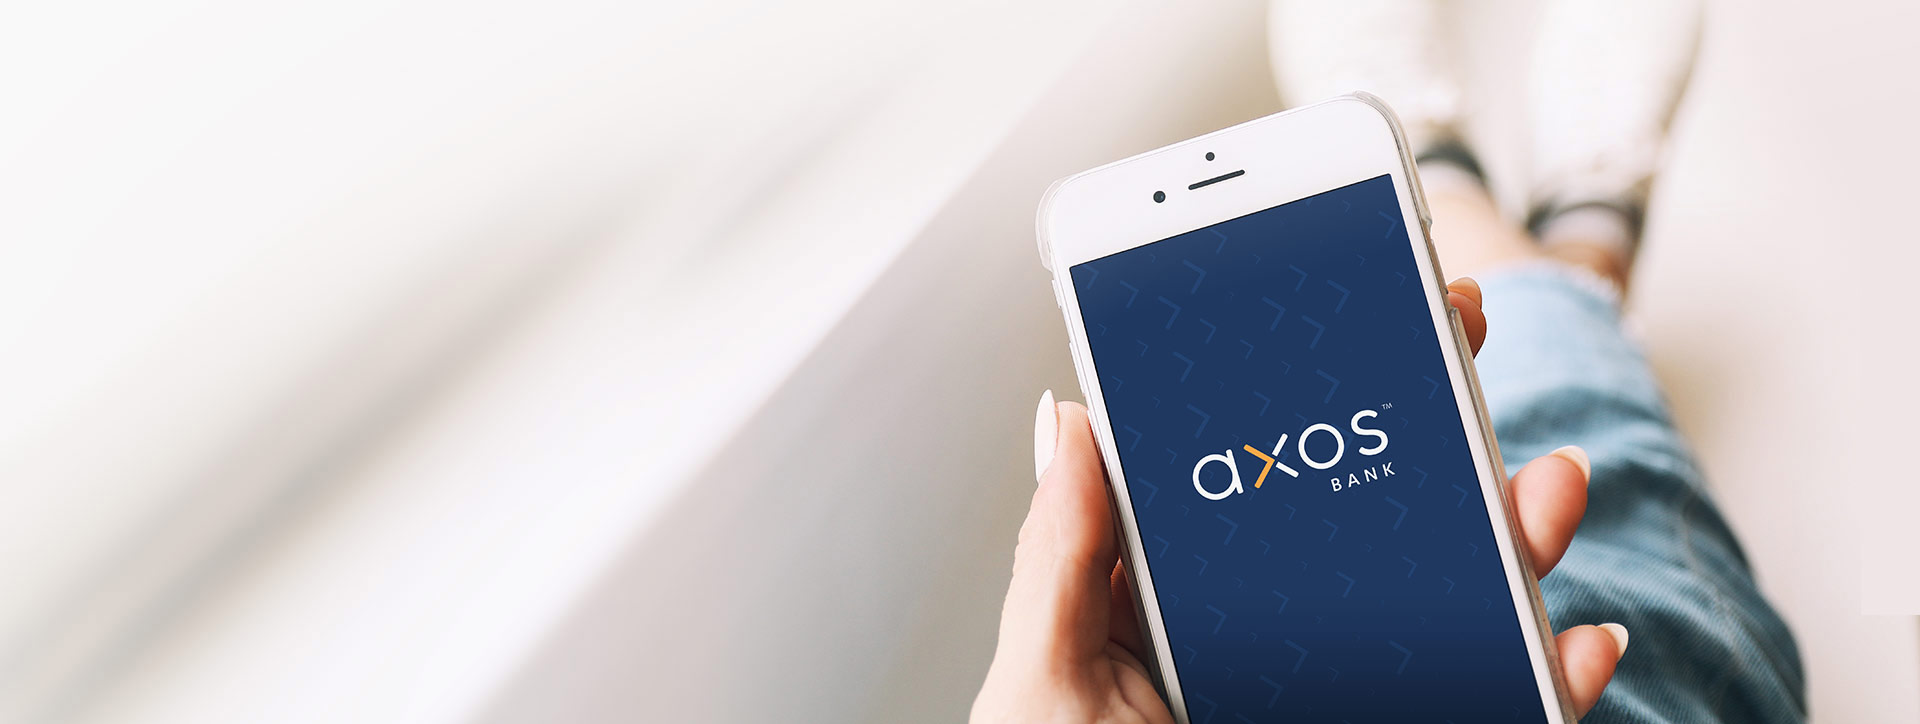 Axos Bank | Personal Banking | Introducing Axos - Banking Evolved